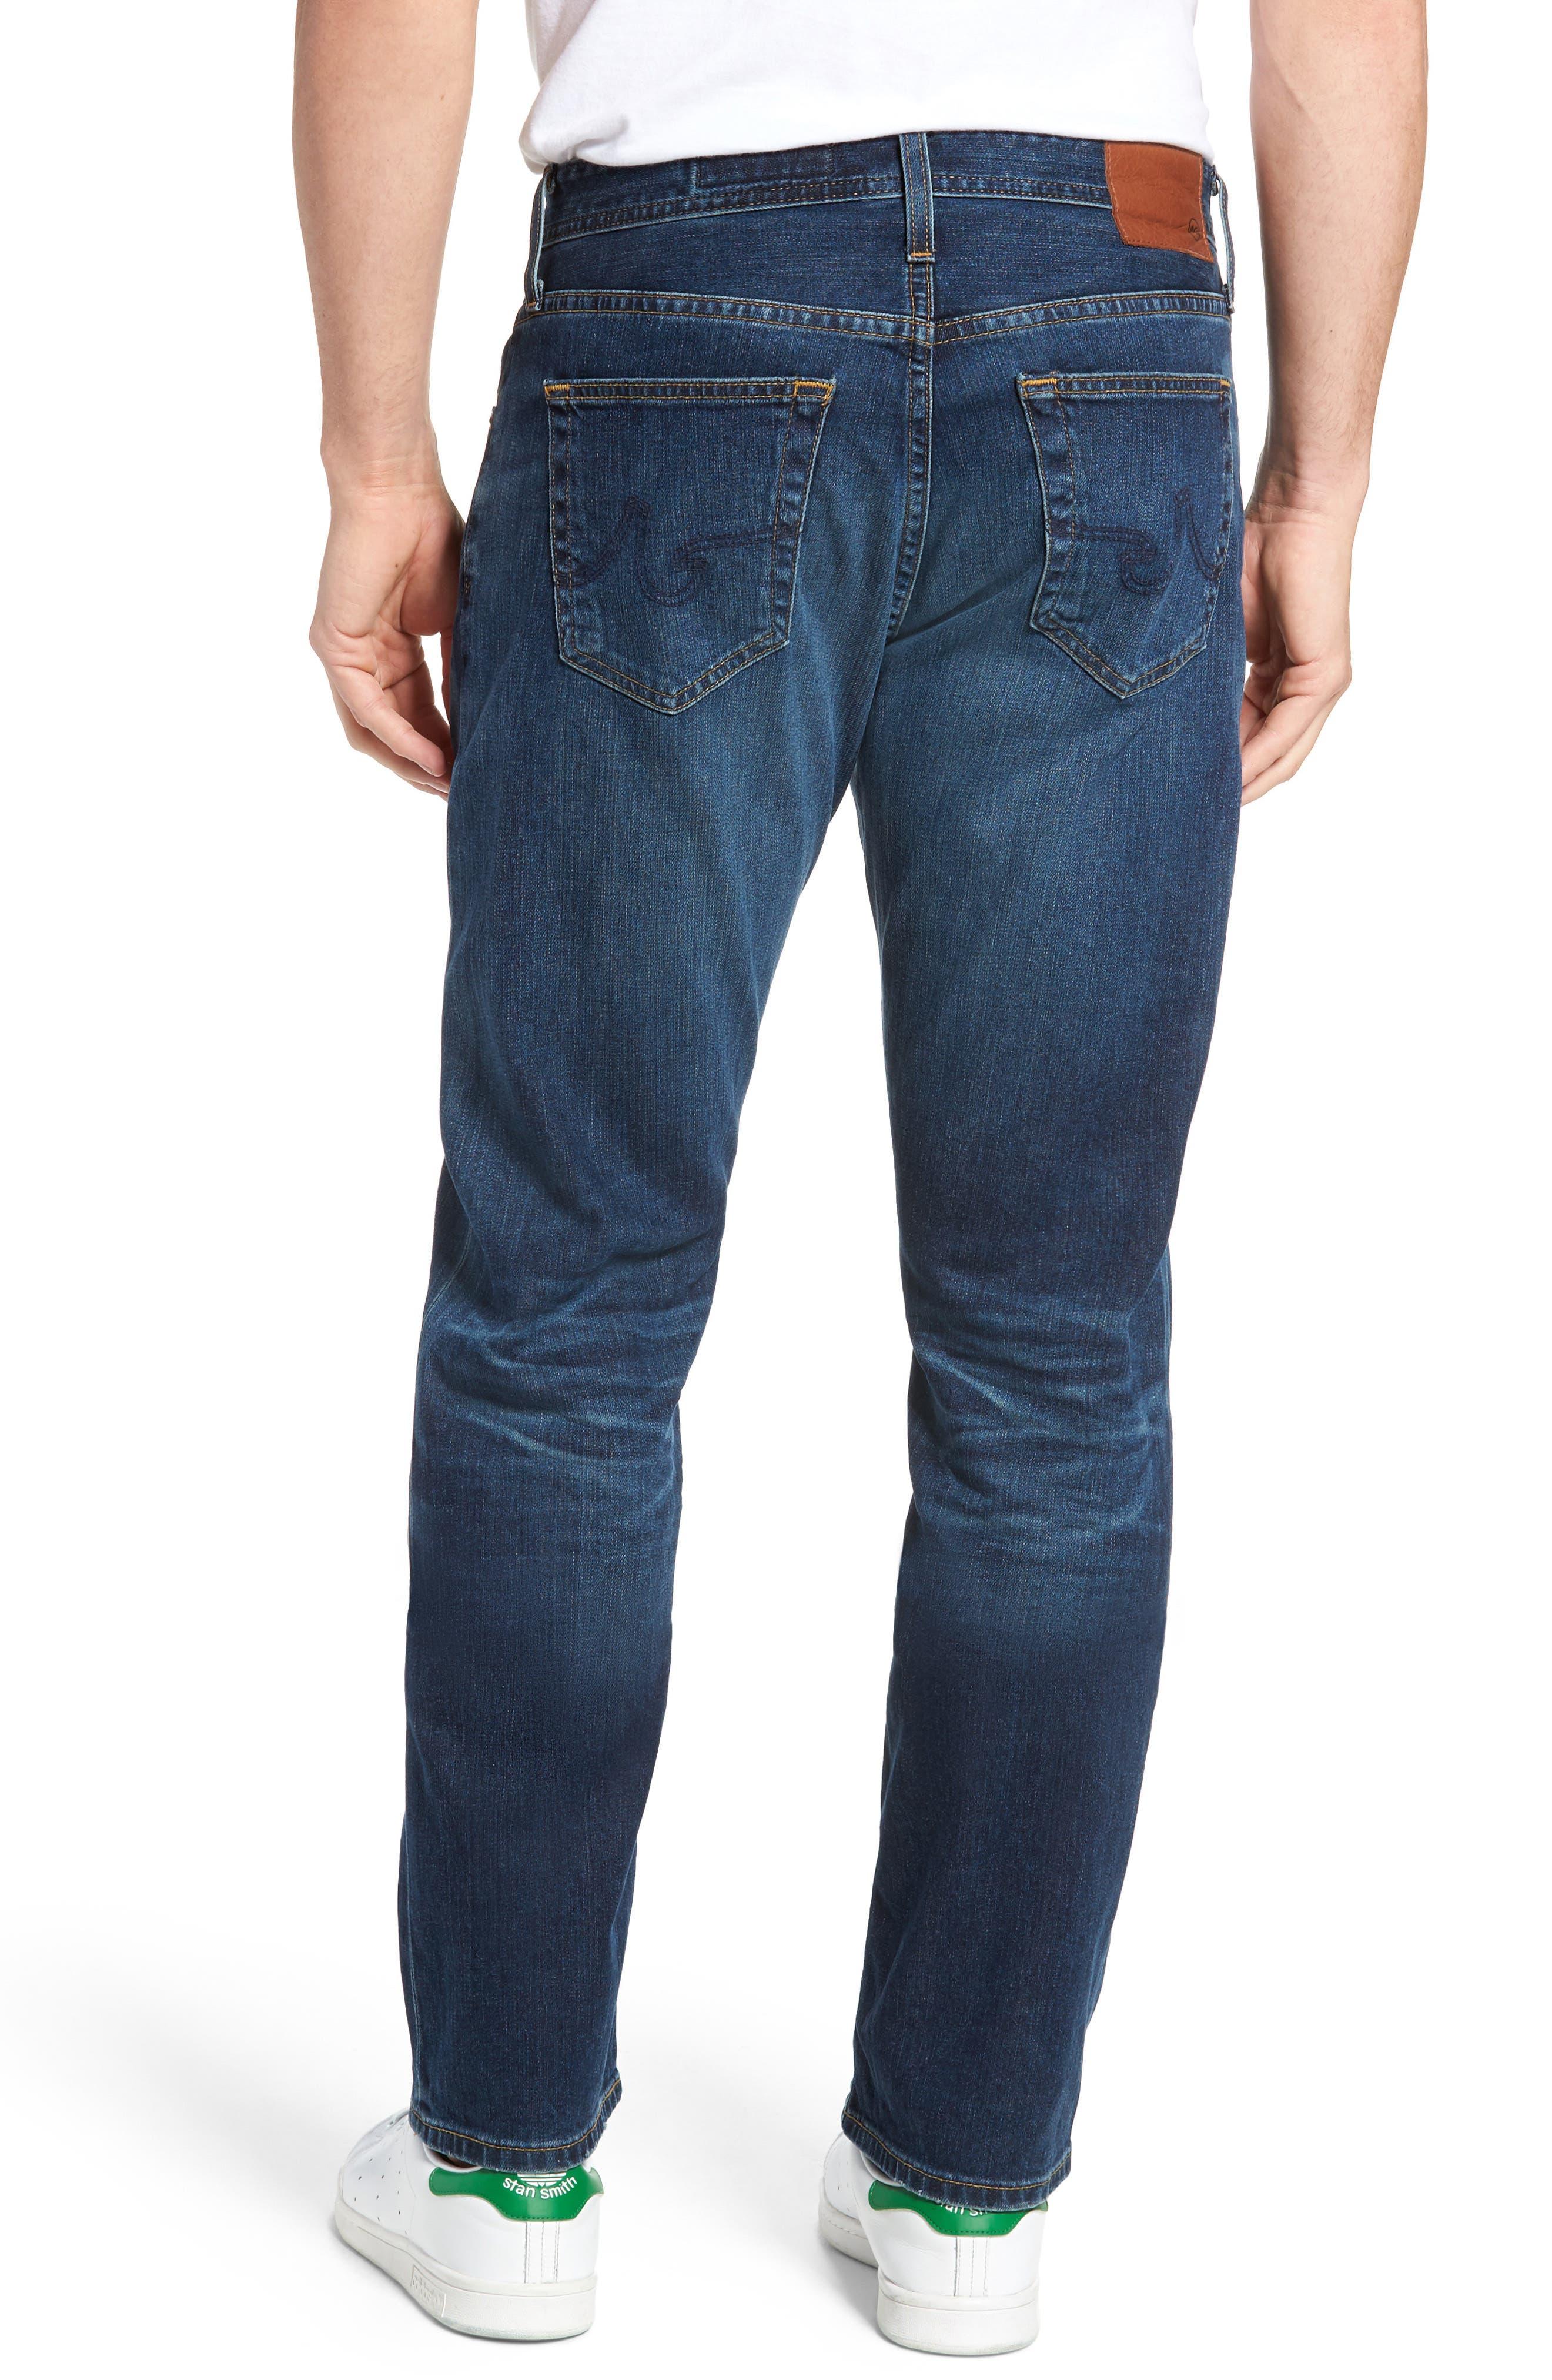 Ives Straight Leg Jeans,                             Alternate thumbnail 2, color,                             478